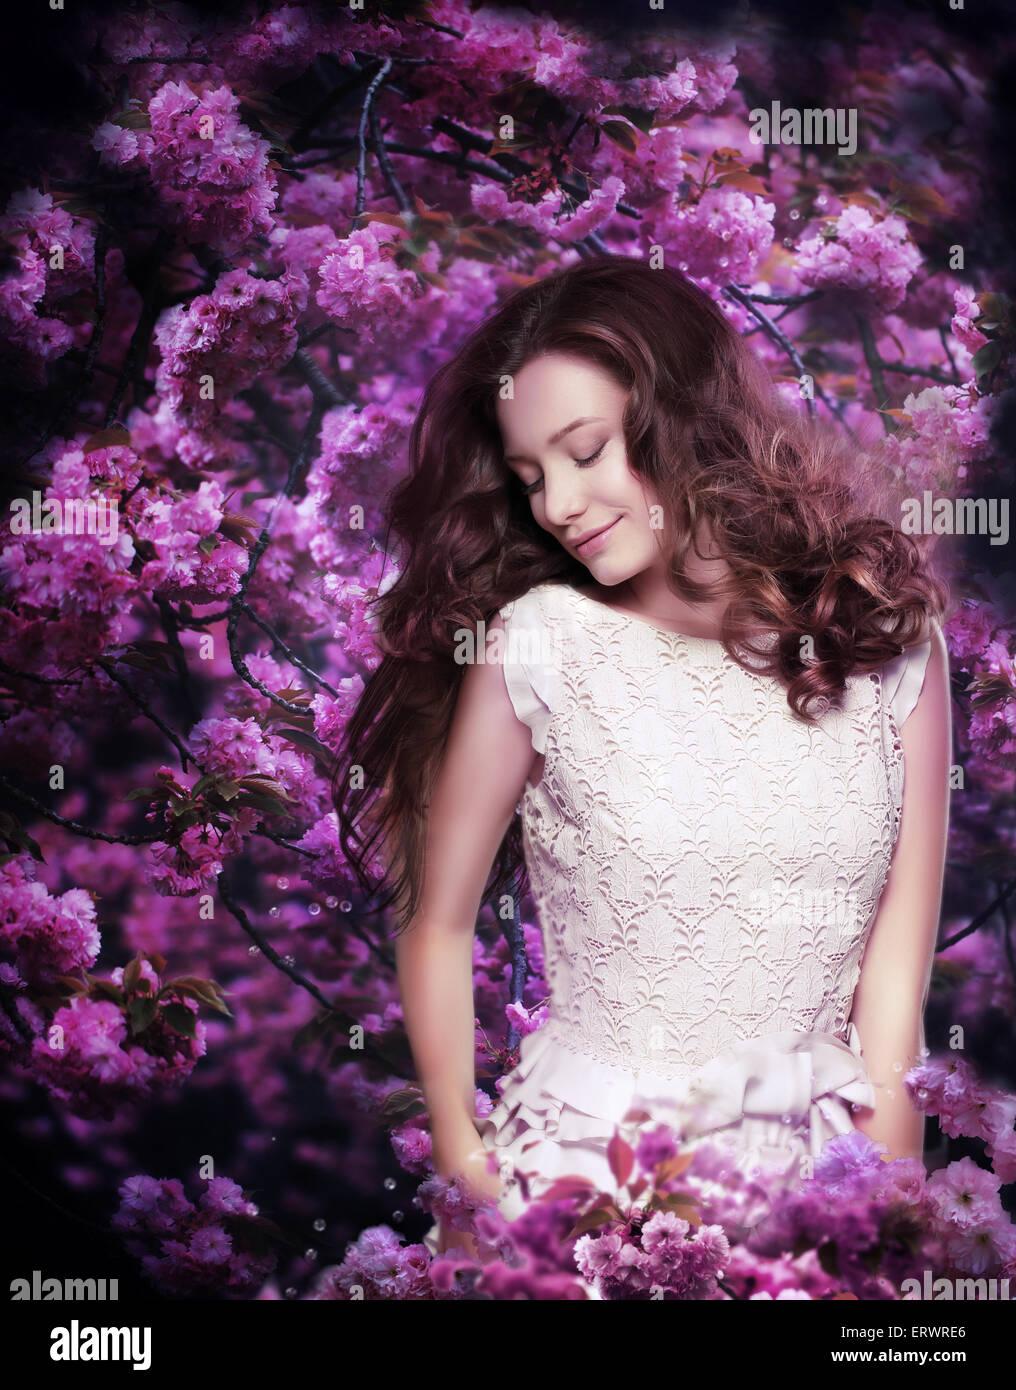 Pure Schönheit. Verträumte junge Frau unter Blütenbäumen Stockbild